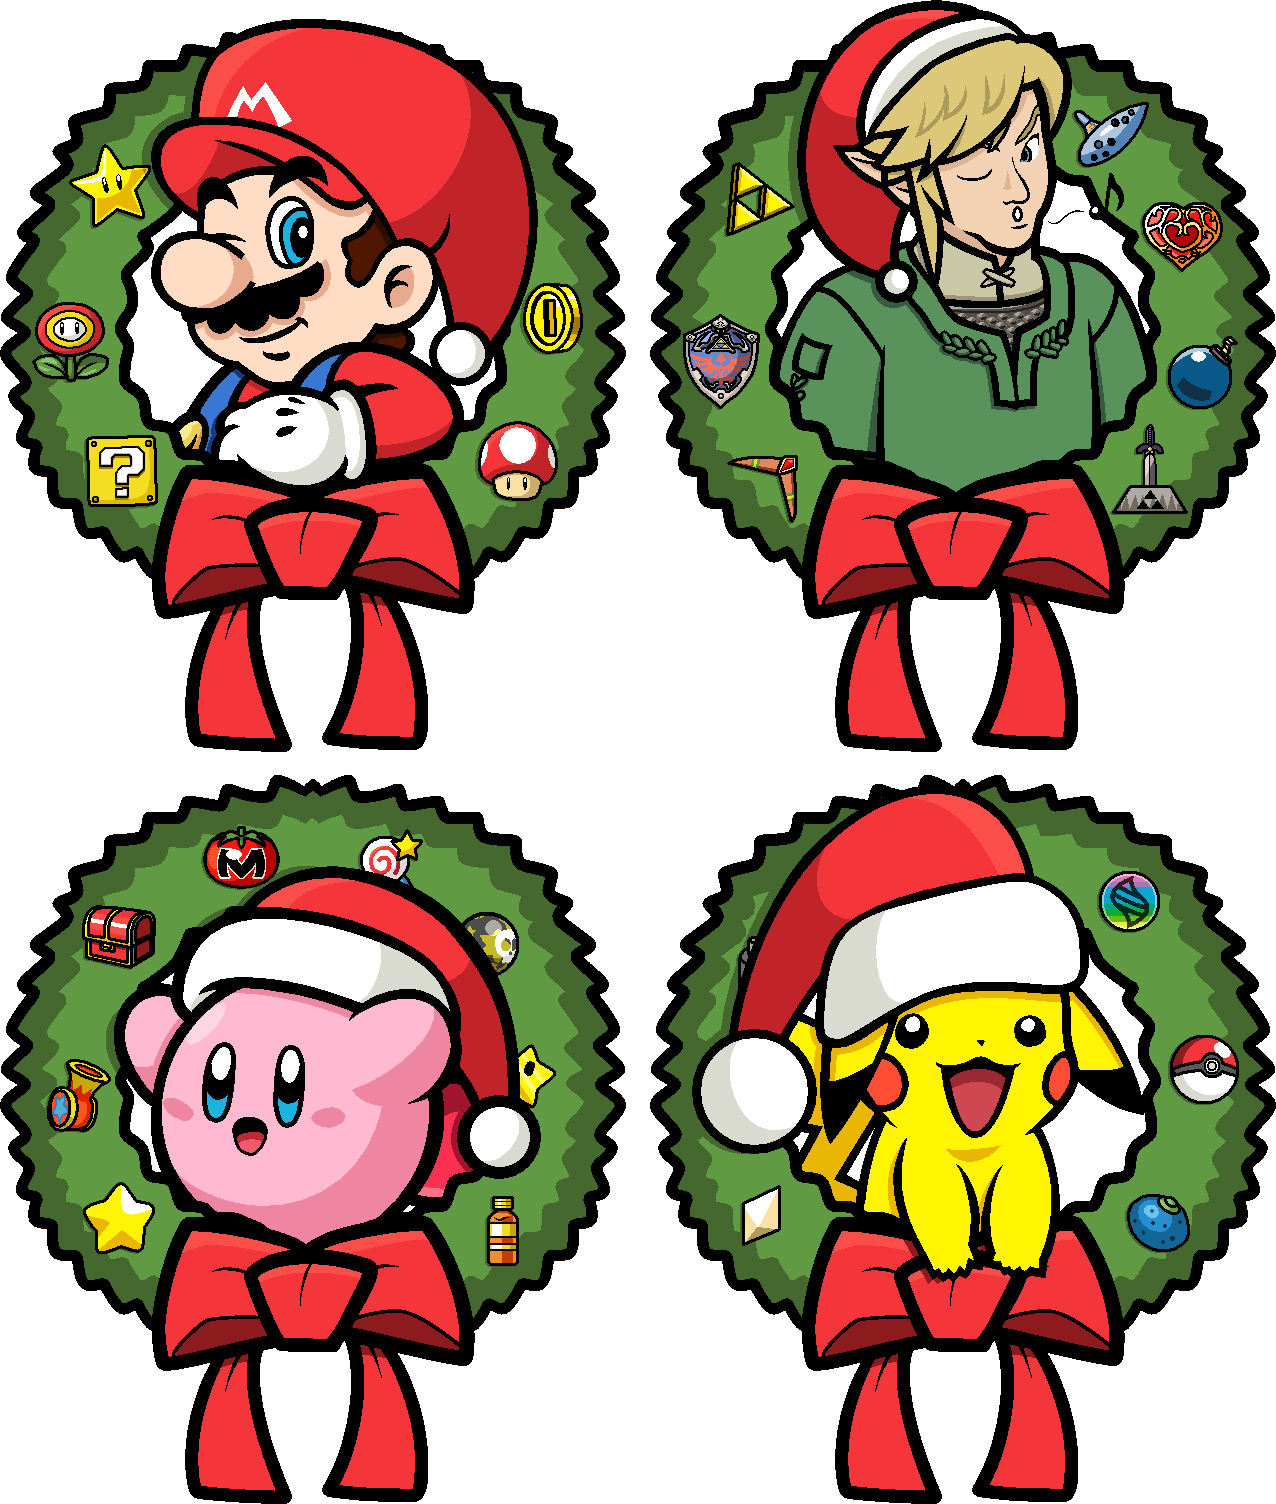 Christmas Mario Png.Super Christmas Roster By Blistinaorgin On Deviantart